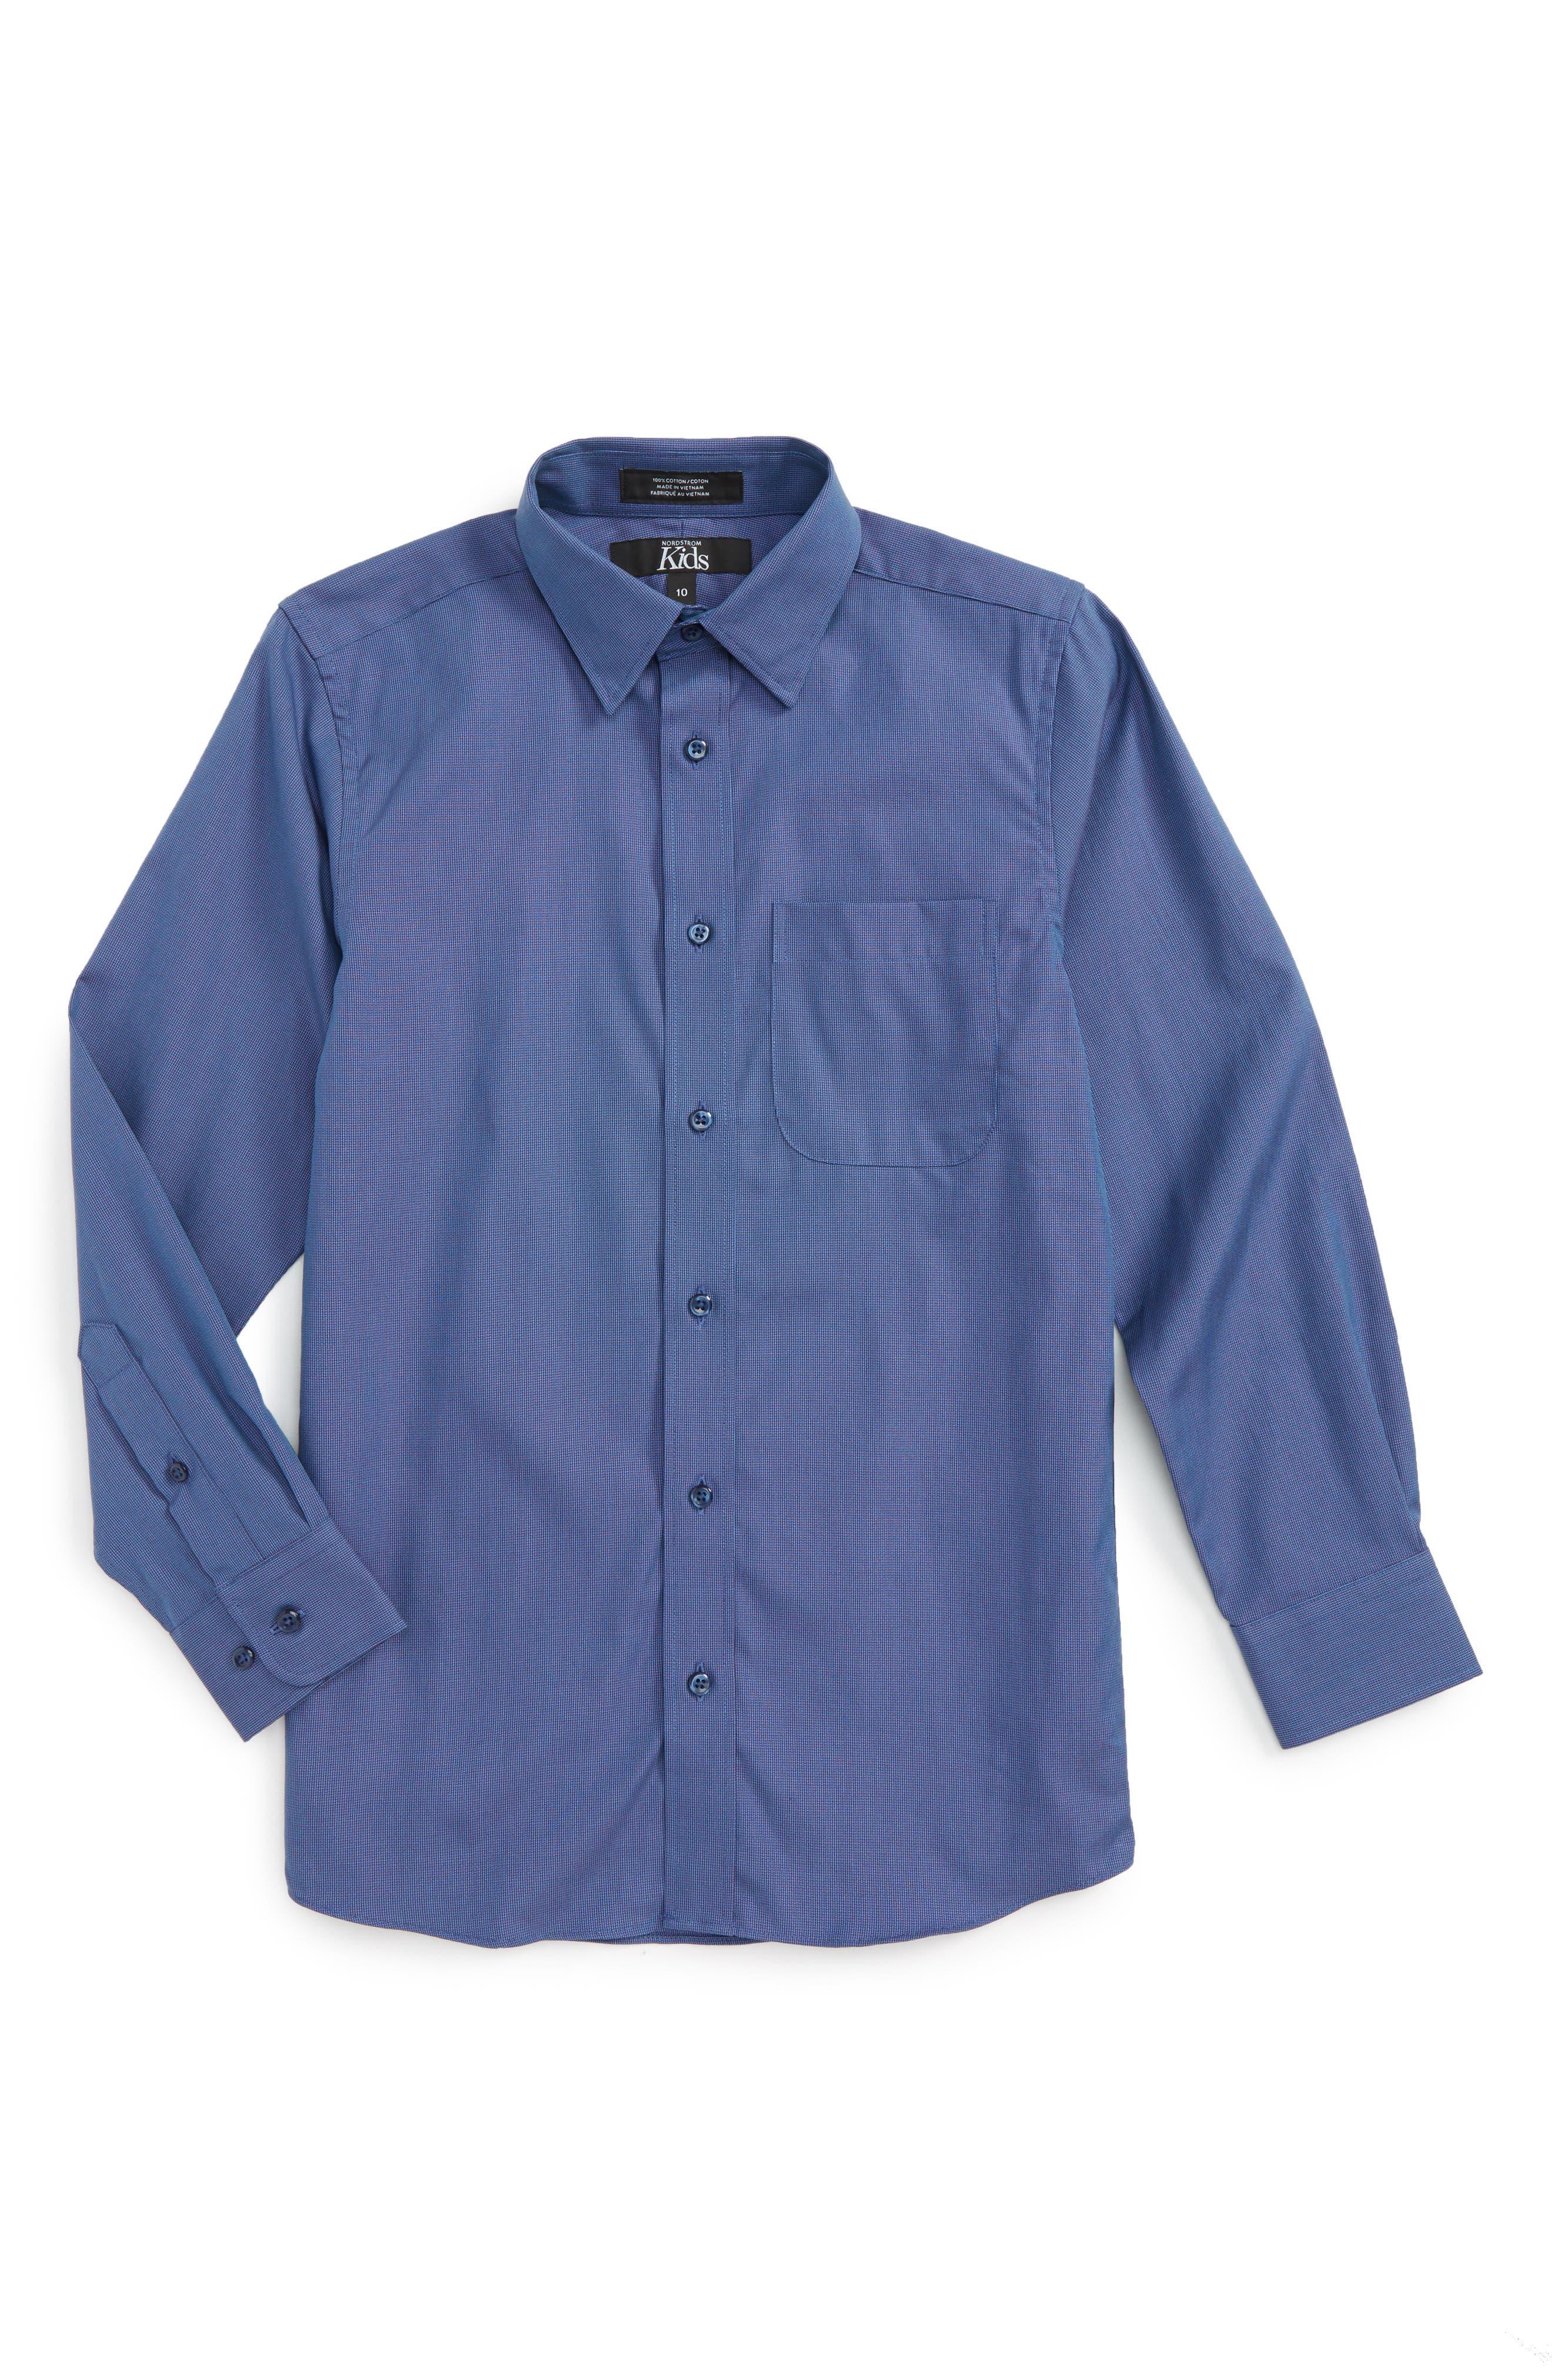 Patriot Cotton Poplin Dress Shirt,                         Main,                         color, 410